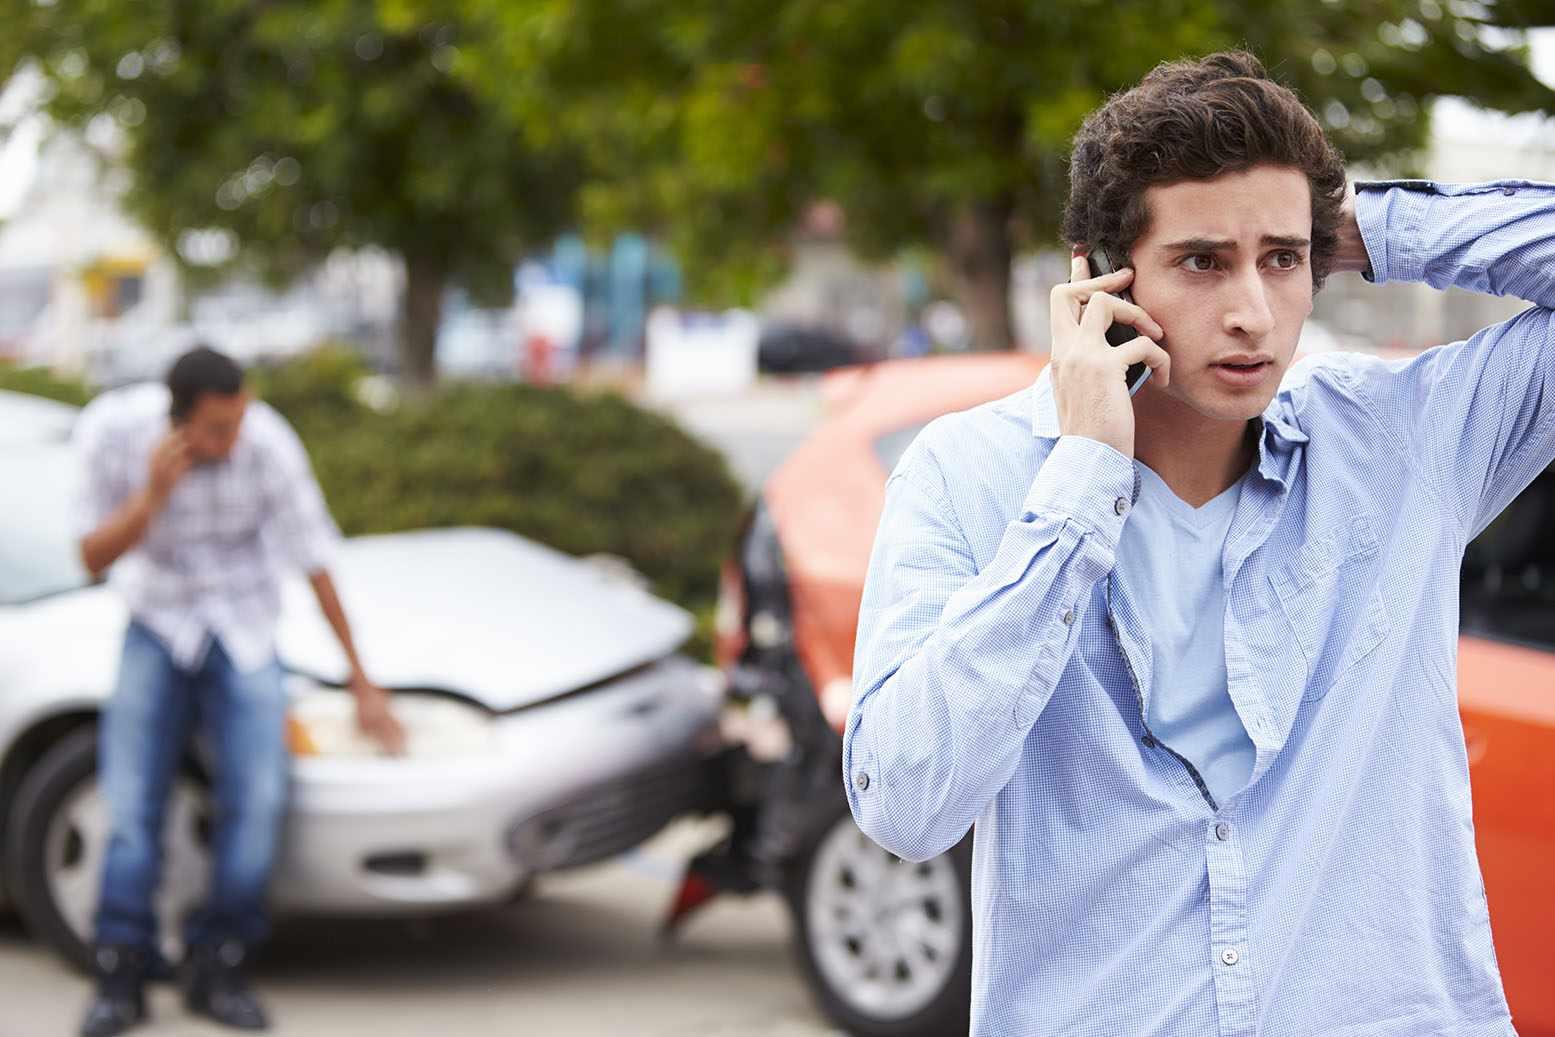 North Carolina Auto Accident Lawyers